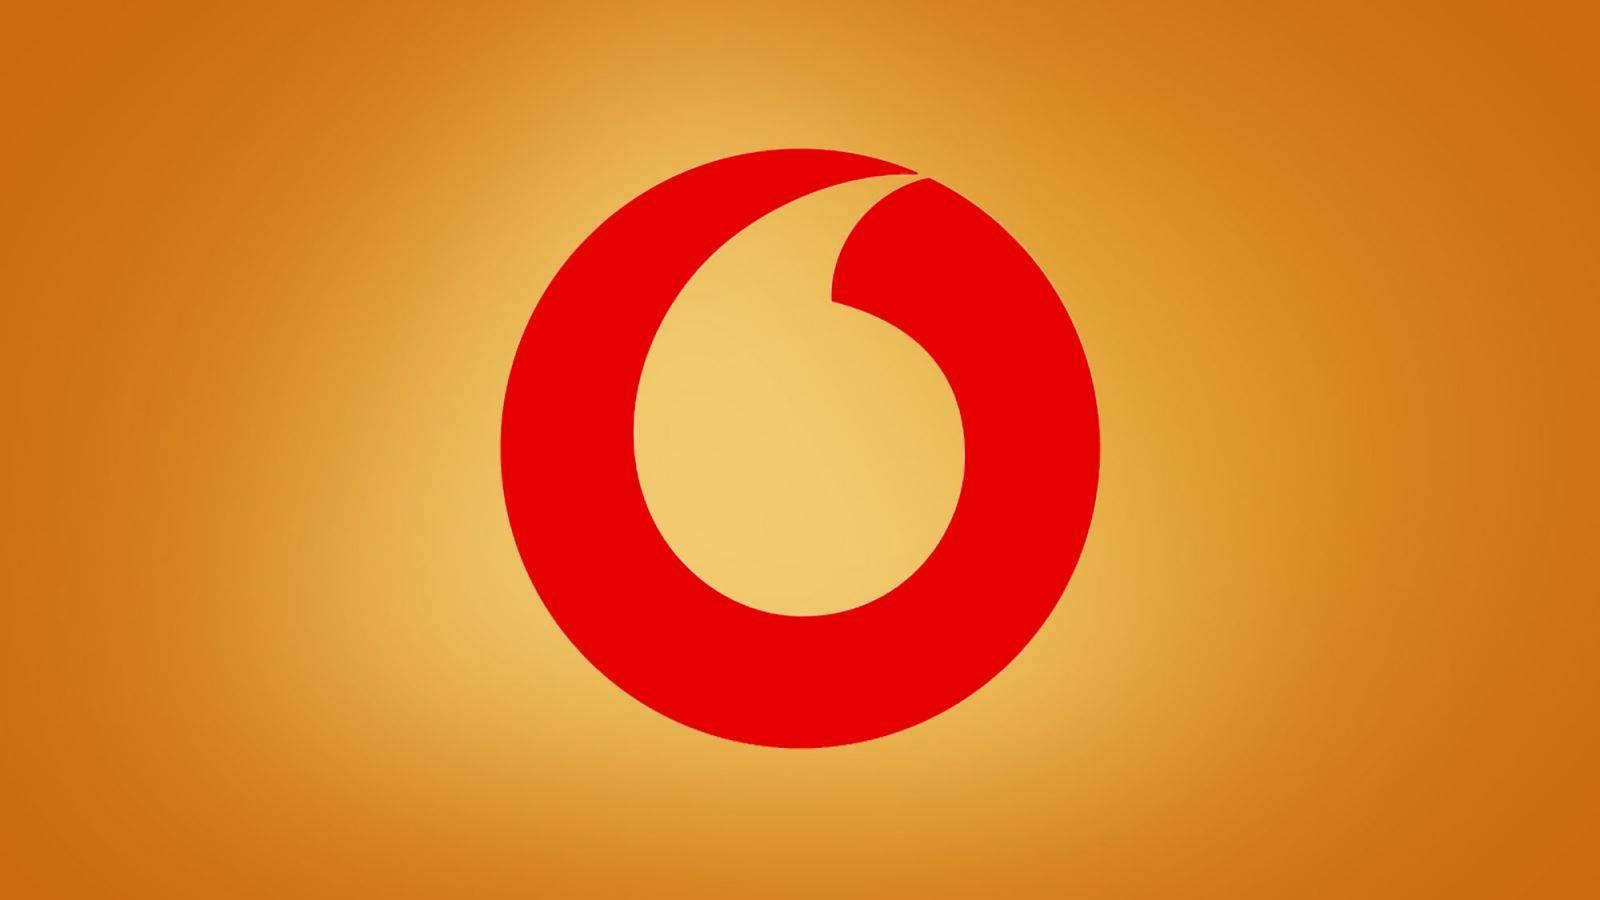 Telefoanele de la Vodafone cu REDUCERI BUNE Inainte de BLACK FRIDAY 2019